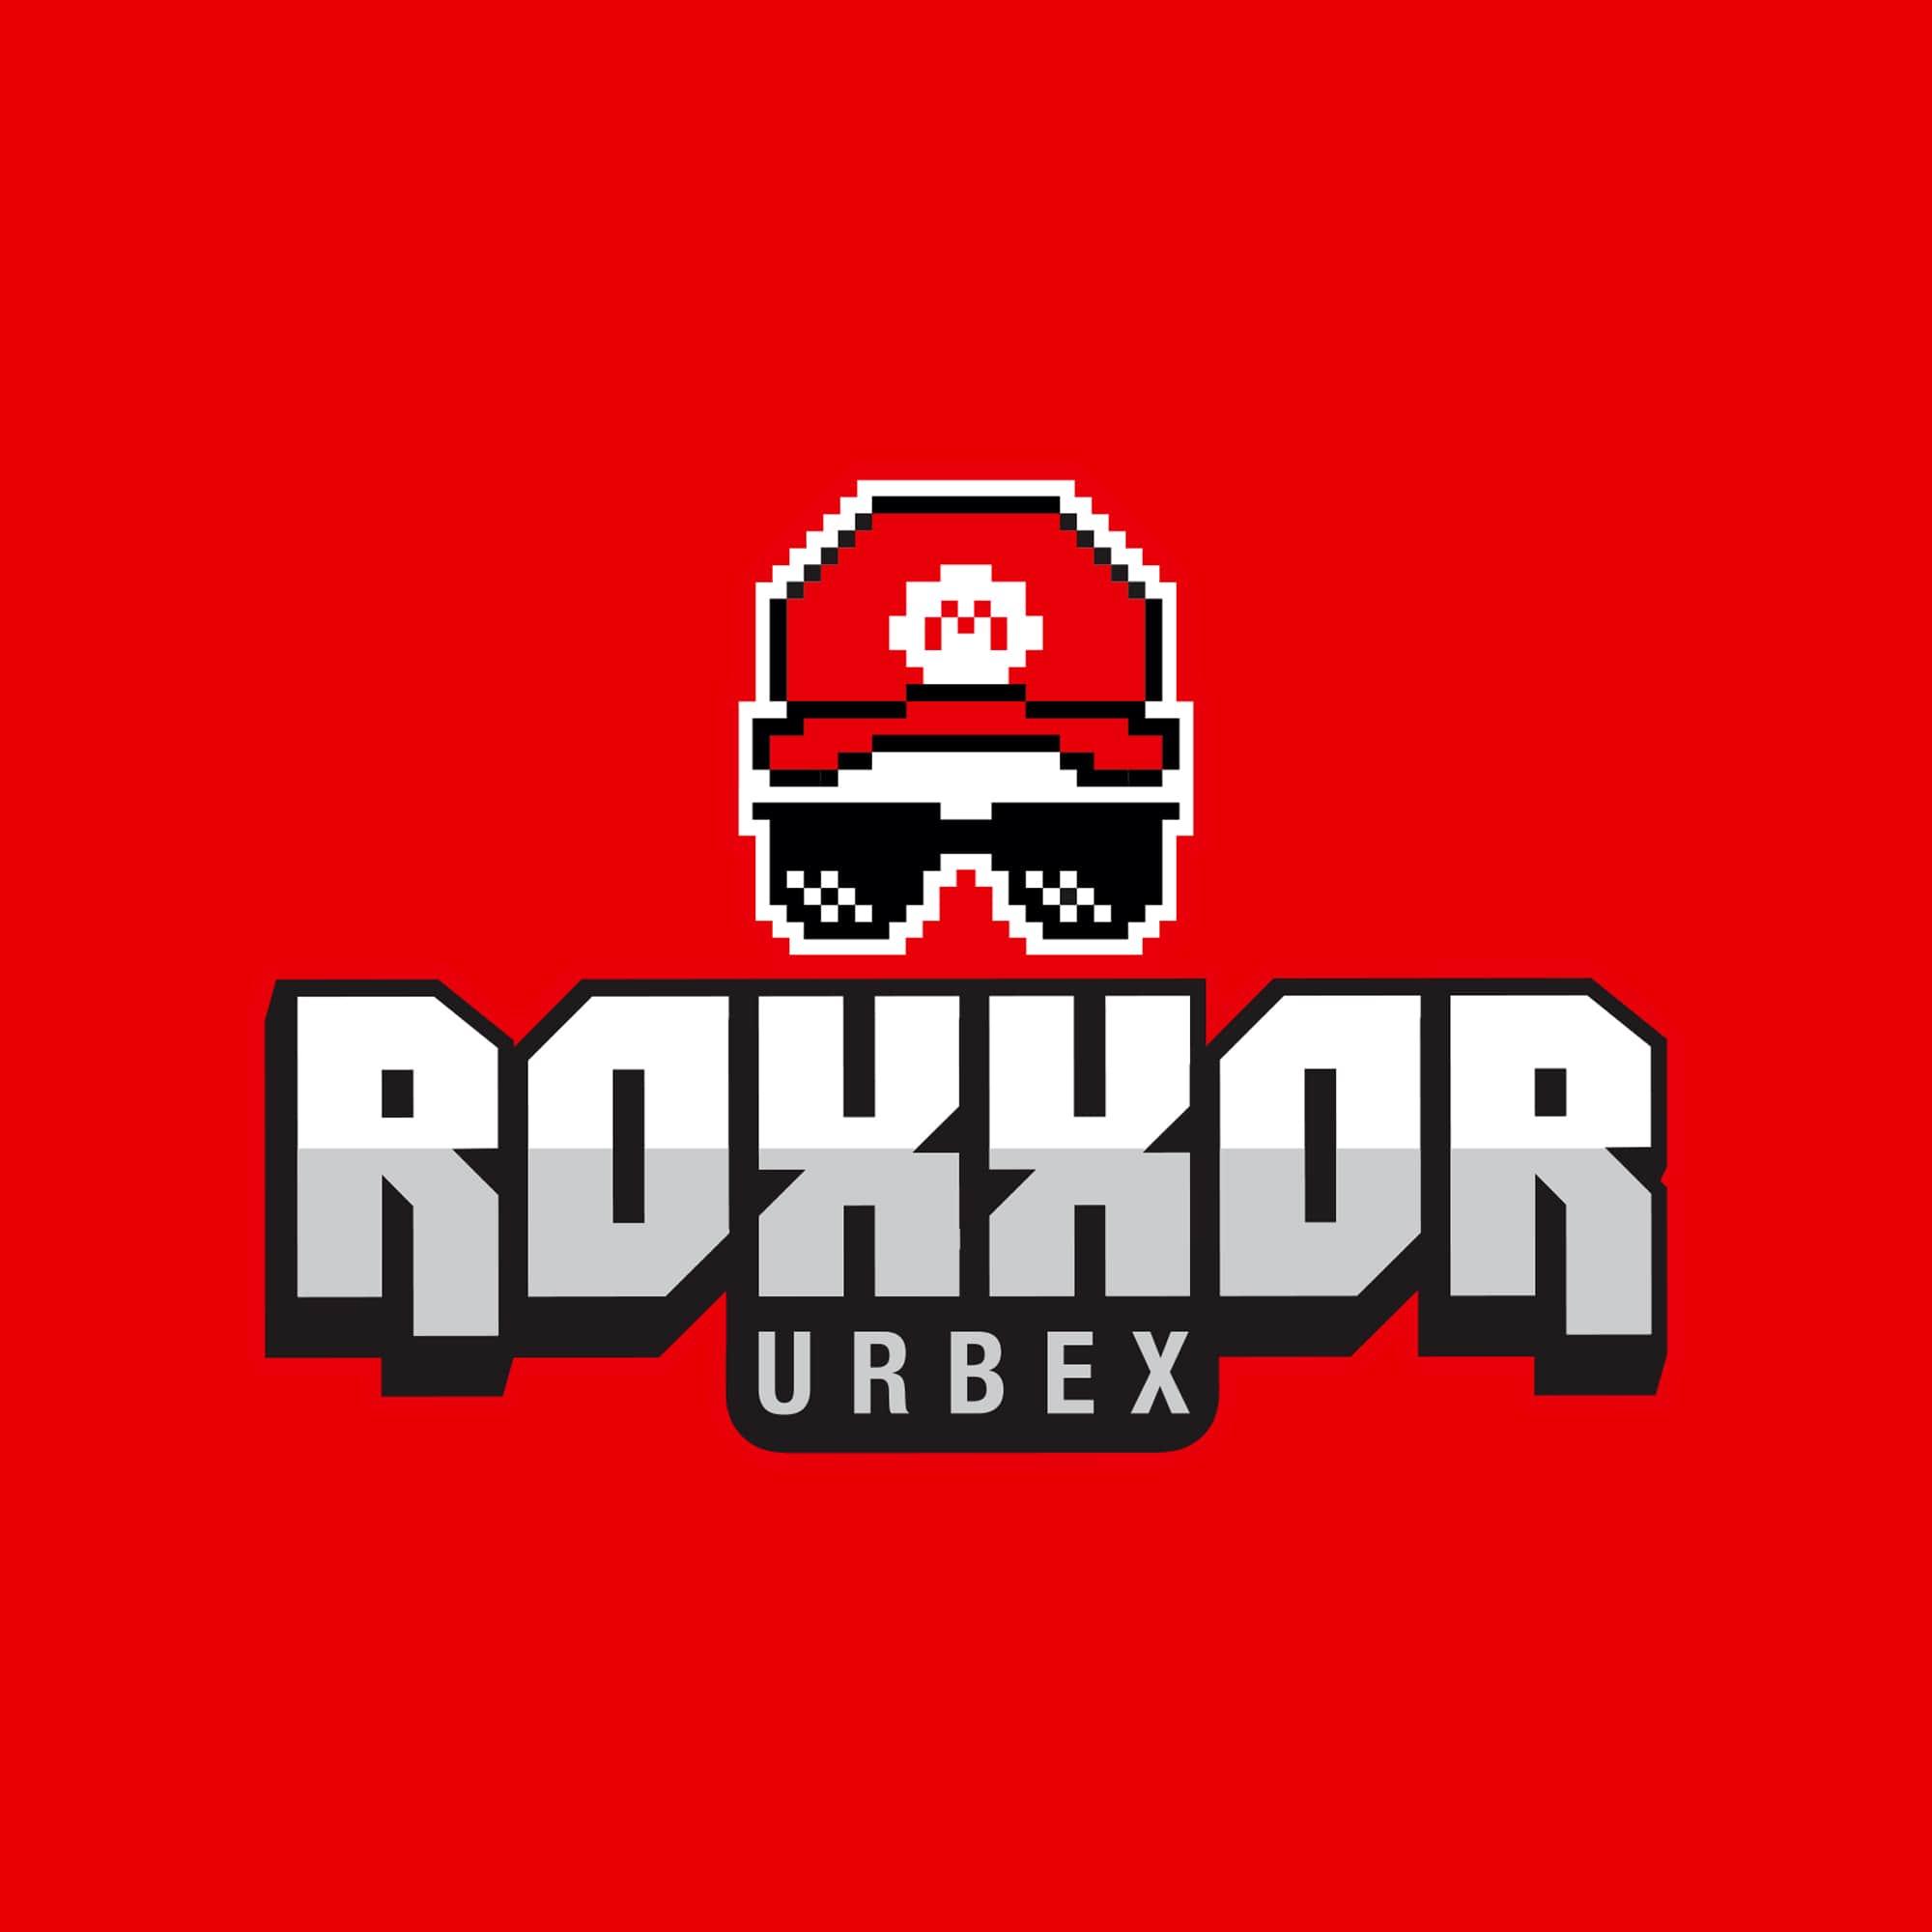 Logo de Roxxor, le youtubeur mégalo fan d'urbex